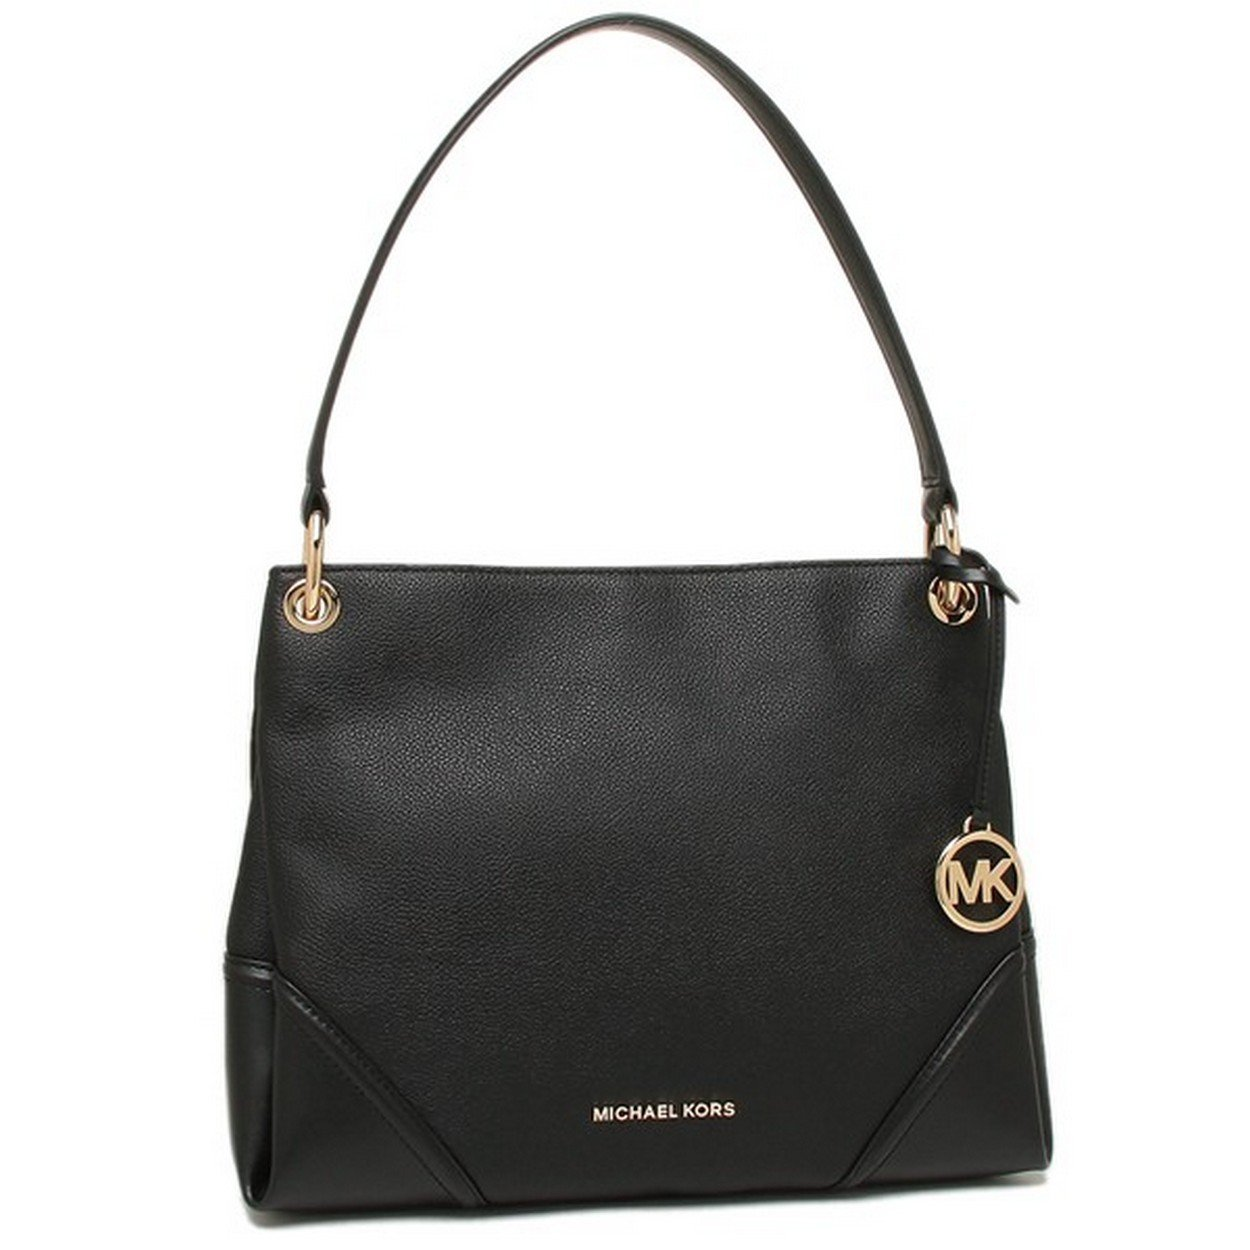 Michael Kors Women's Nicole Shoulder Bag Black MK27538